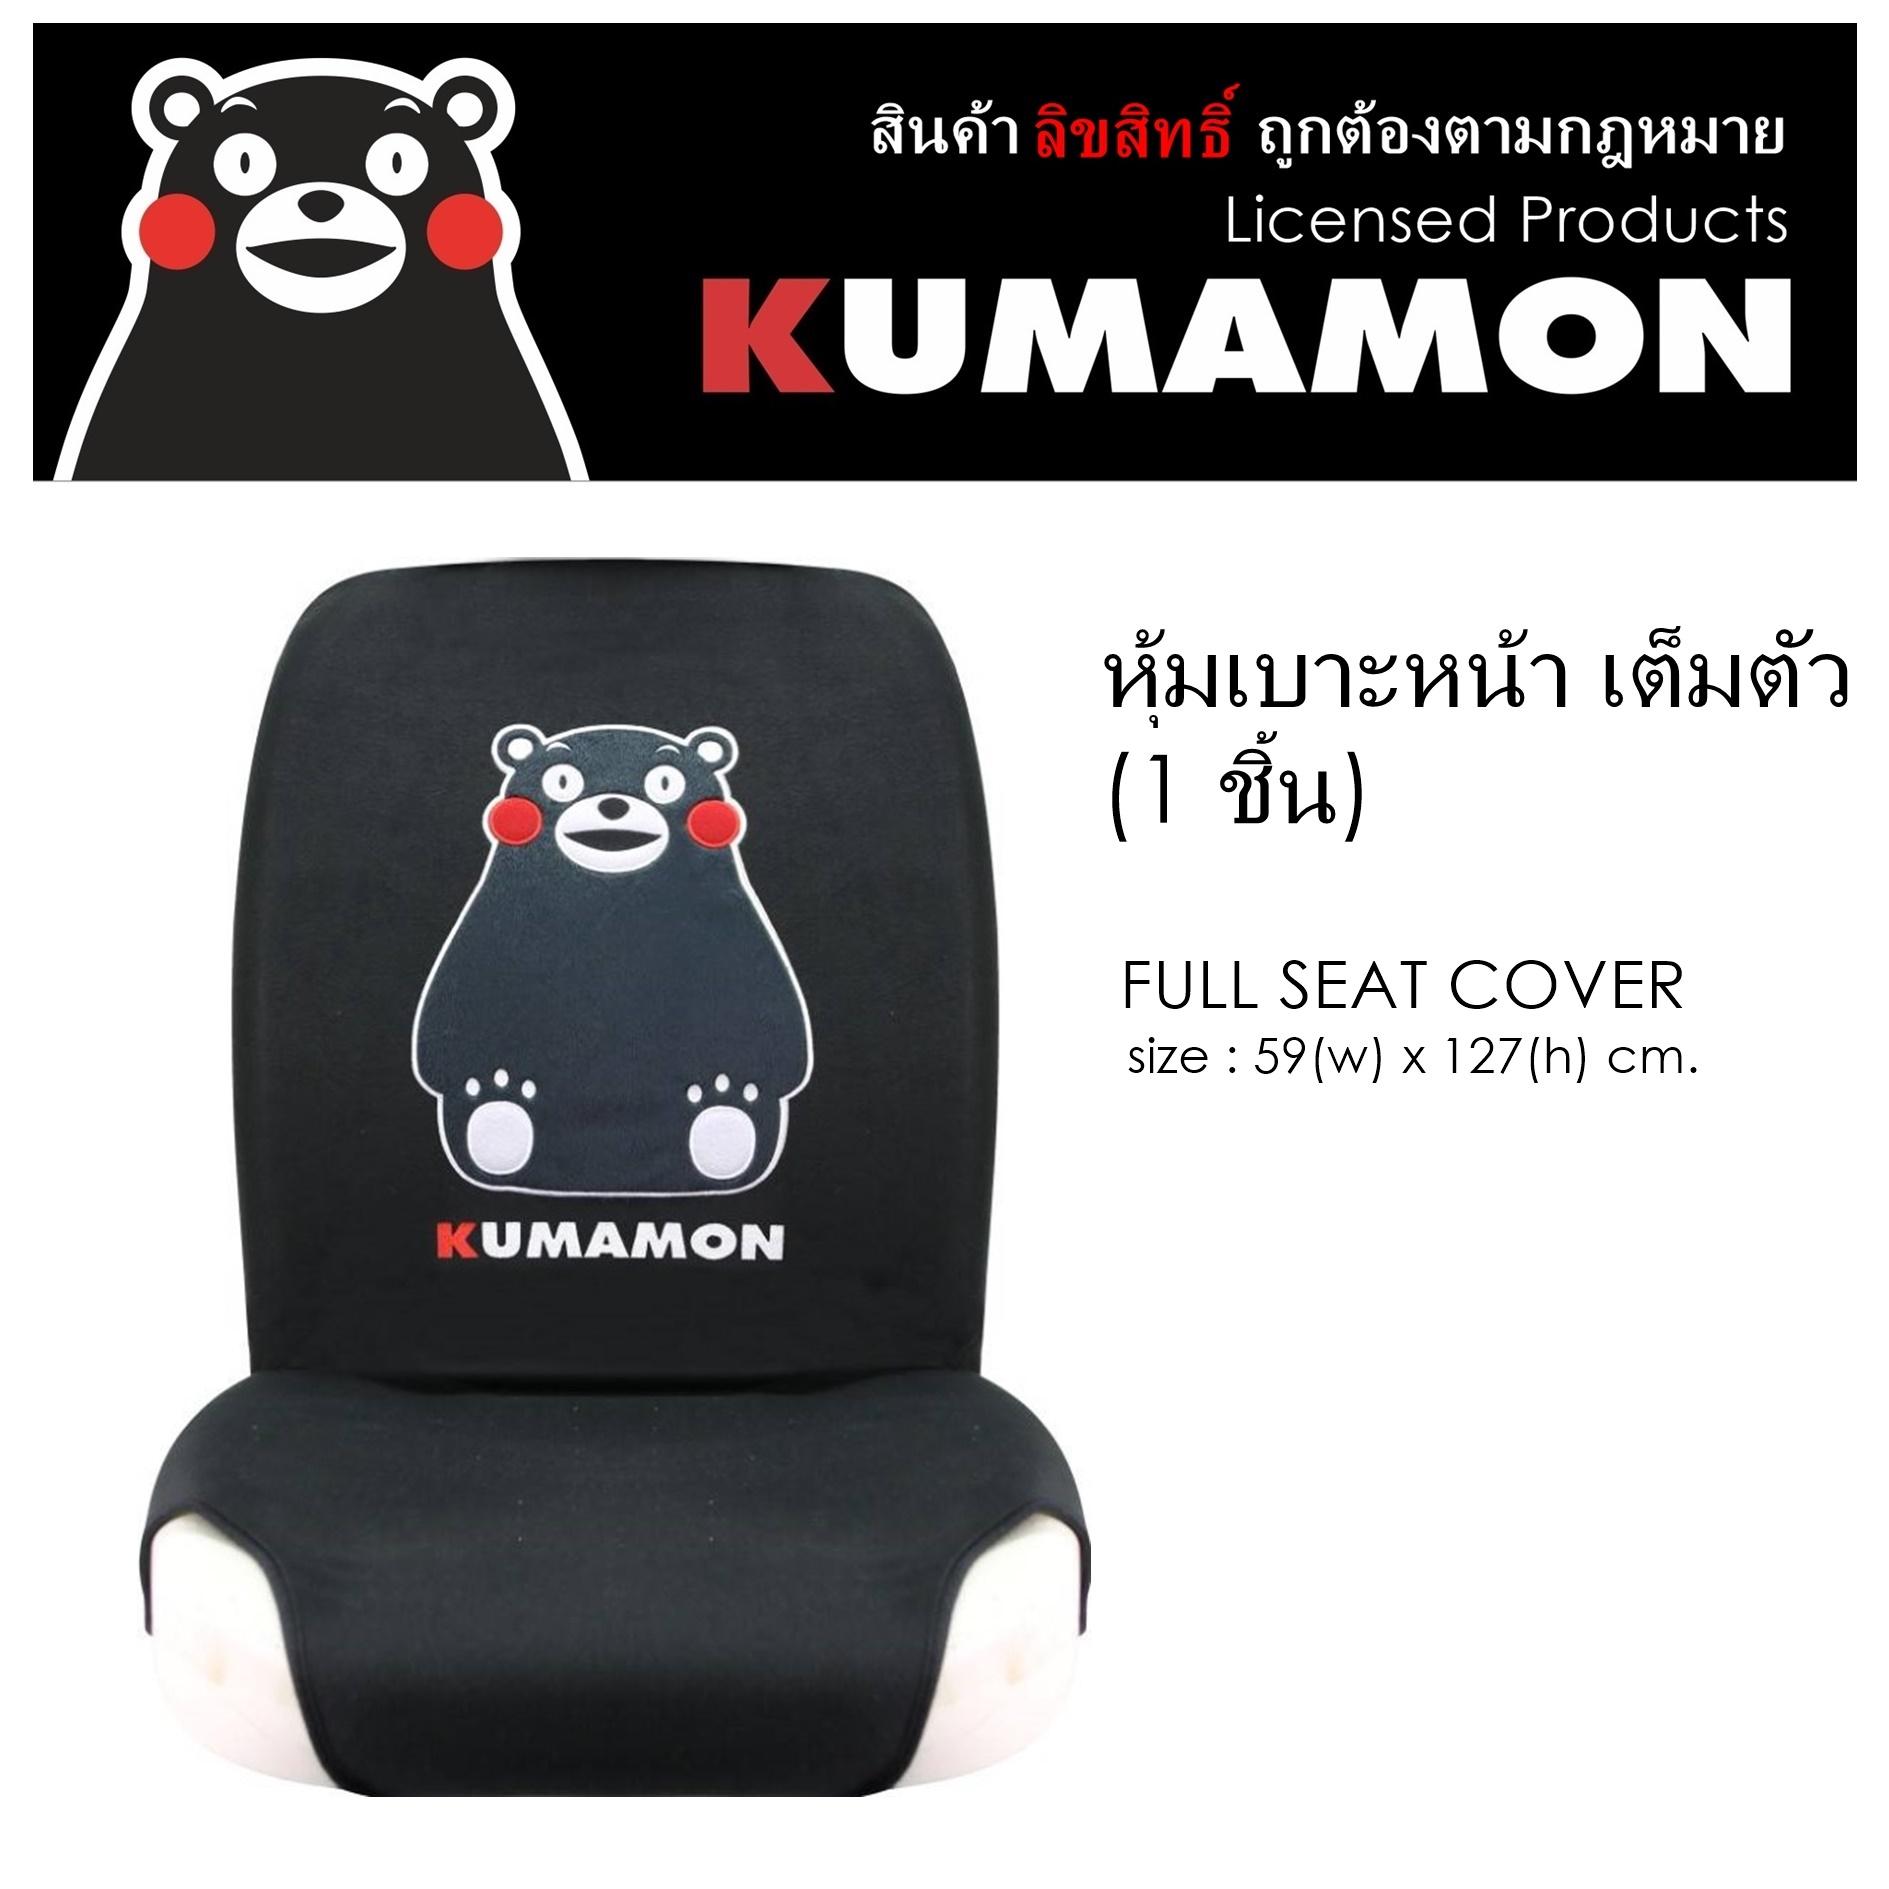 KUMAMON คุมะมง ผ้าหุ้มเบาะหน้าเต็มตัว Full Seat Cover กันรอยและสิ่งสกปรก ขนาด 59(w)x127(h) cm. งานลิขสิทธิ์แท้ ใช้หุ้มเบาะรถยนต์ ปกป้องเบาะรถจากความร้อน รอยขีดข่วน กันเปื้อน กันสิ่งสกปรก ใช้ตกแต่งภายในรถเพื่อความสวยงาม ผลิตจากผ้า Tricot บุฟองน้ำ ตกแต่งด้ว